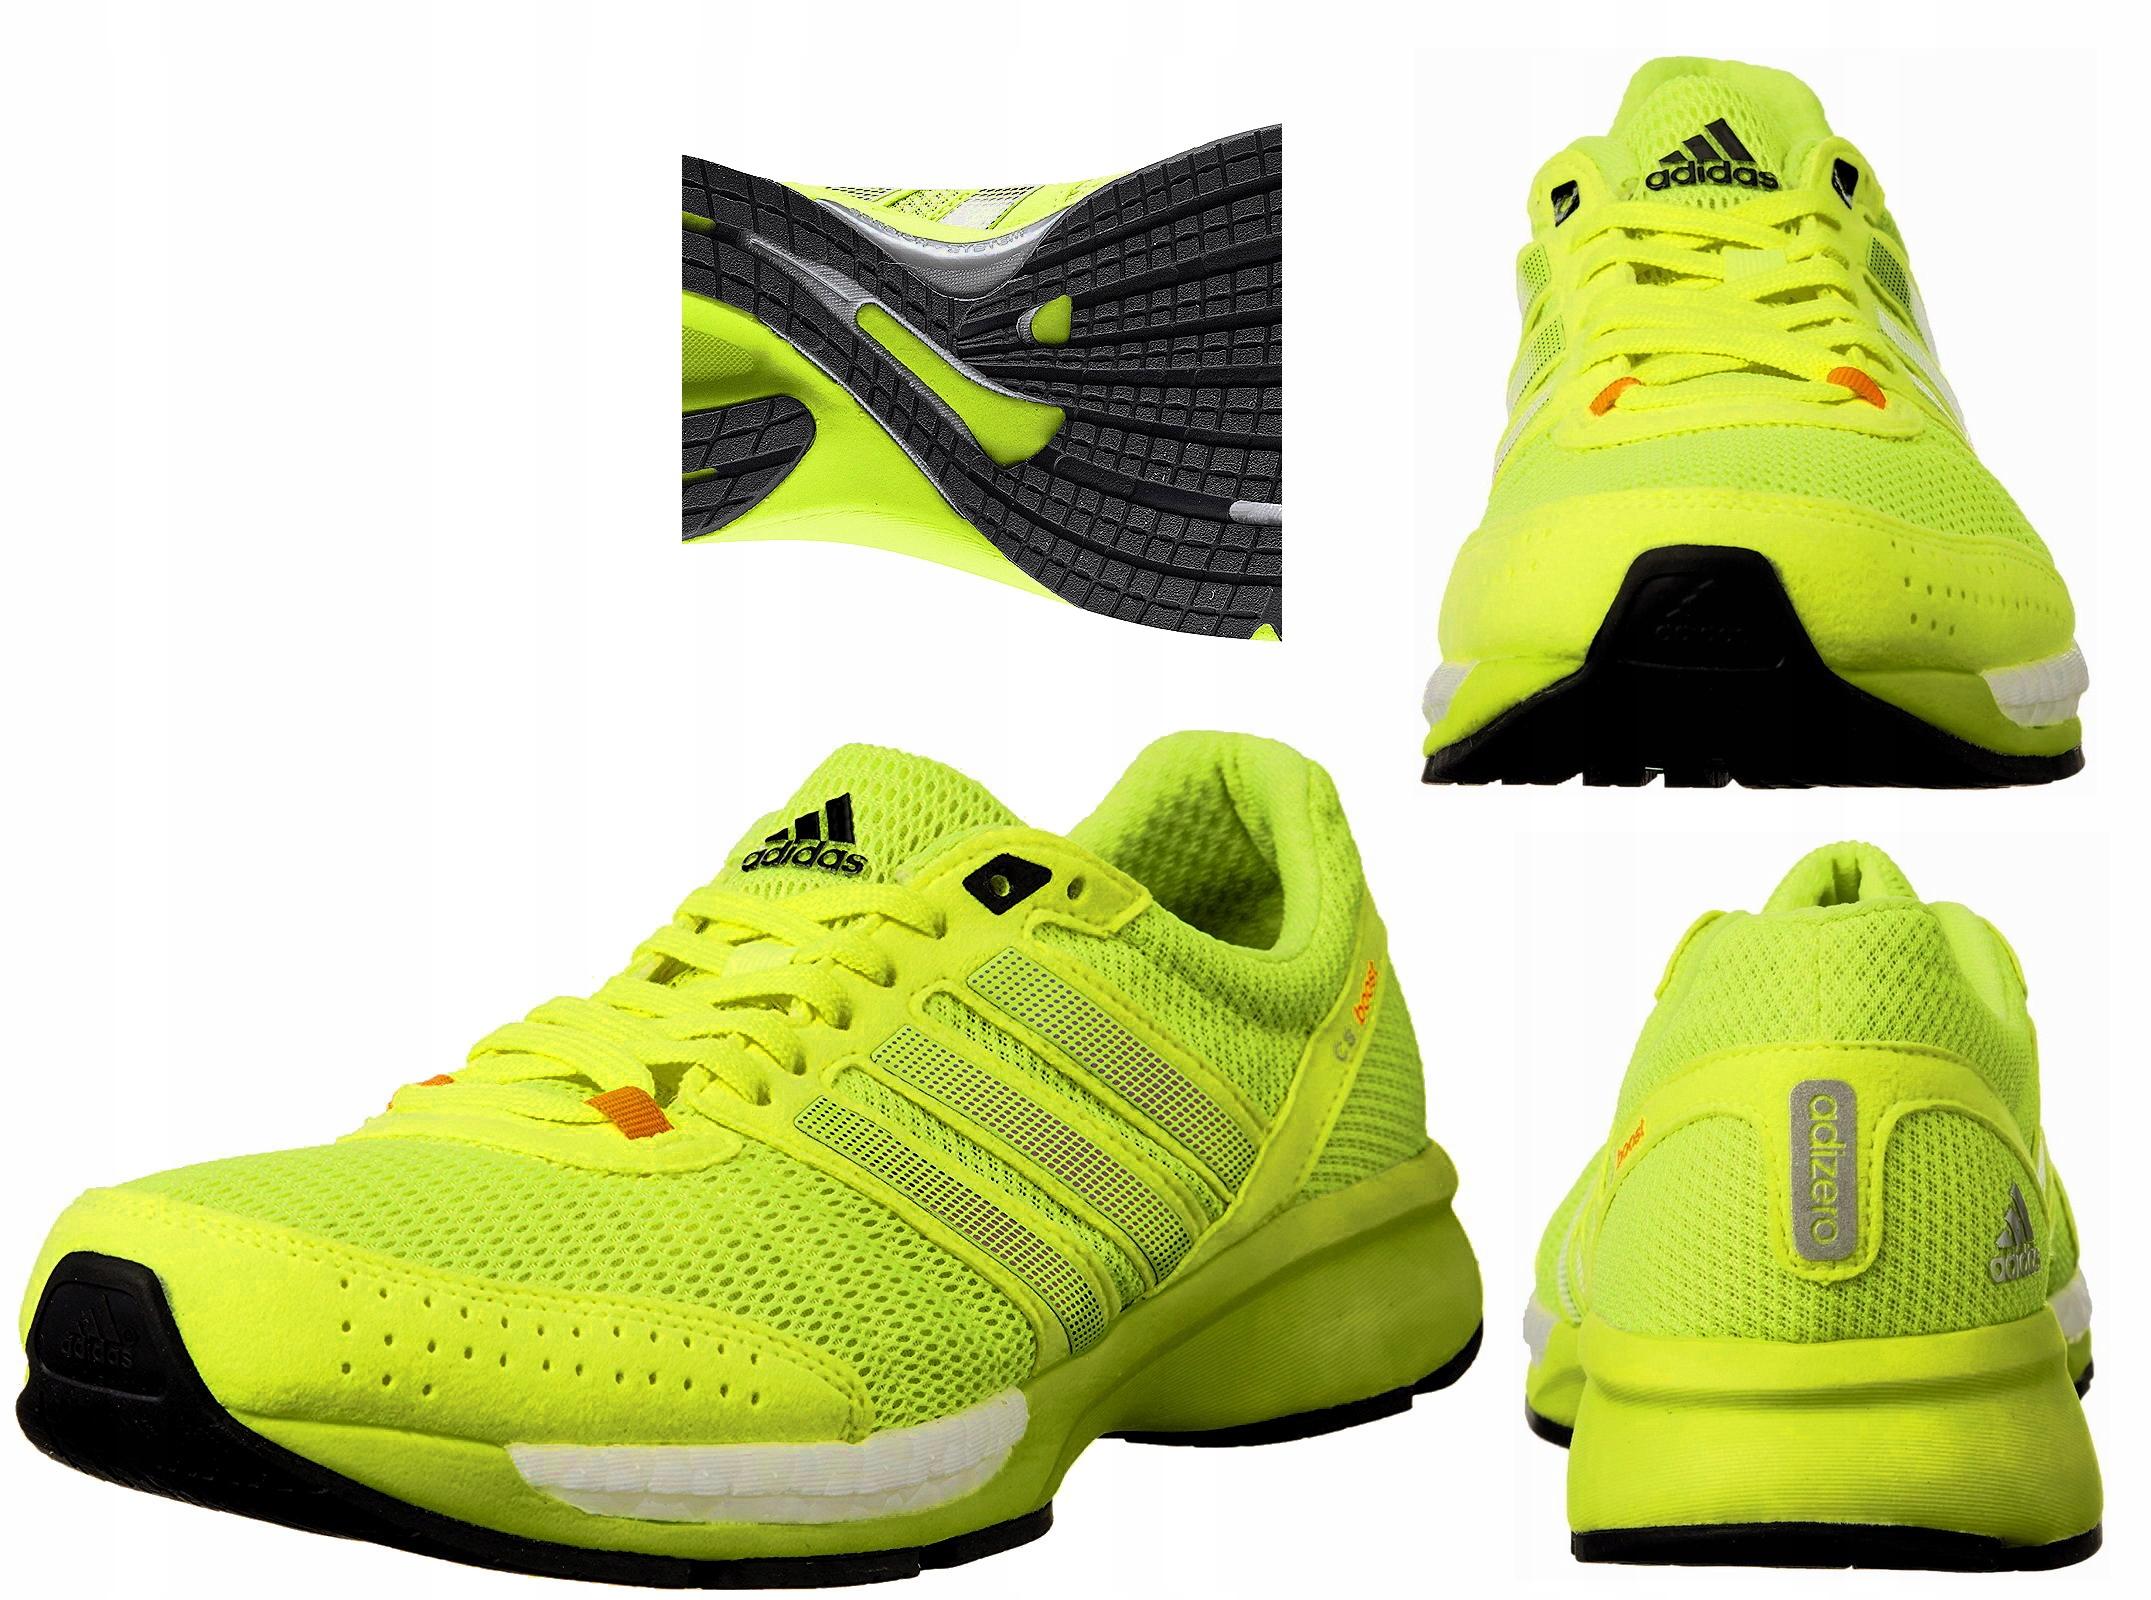 the latest e0c73 58fa0 Adidas AdiZero Ace 7 Boost buty męskie - 48 - 7363657179 ...